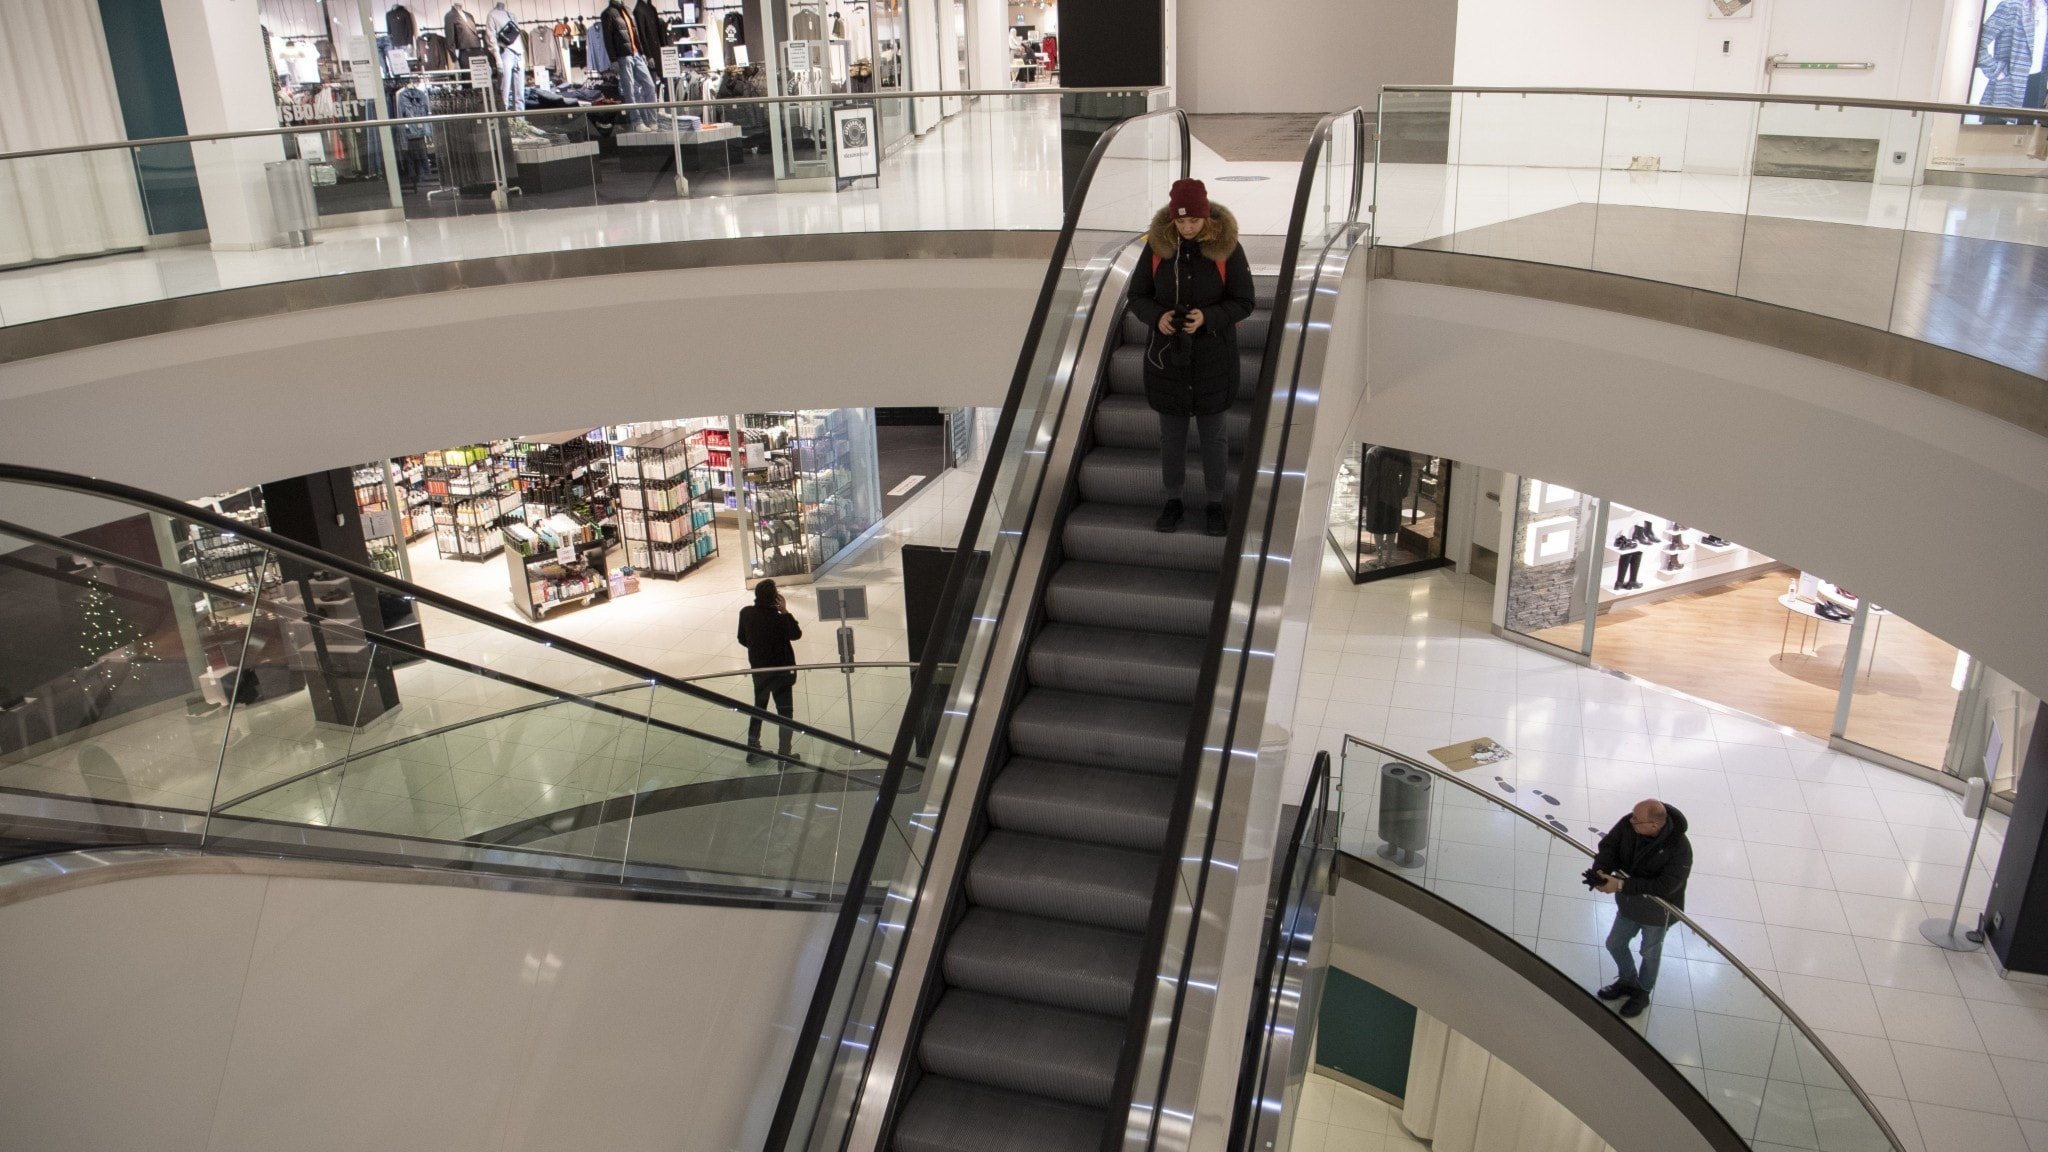 Almost empty escalator in a shopping mall.